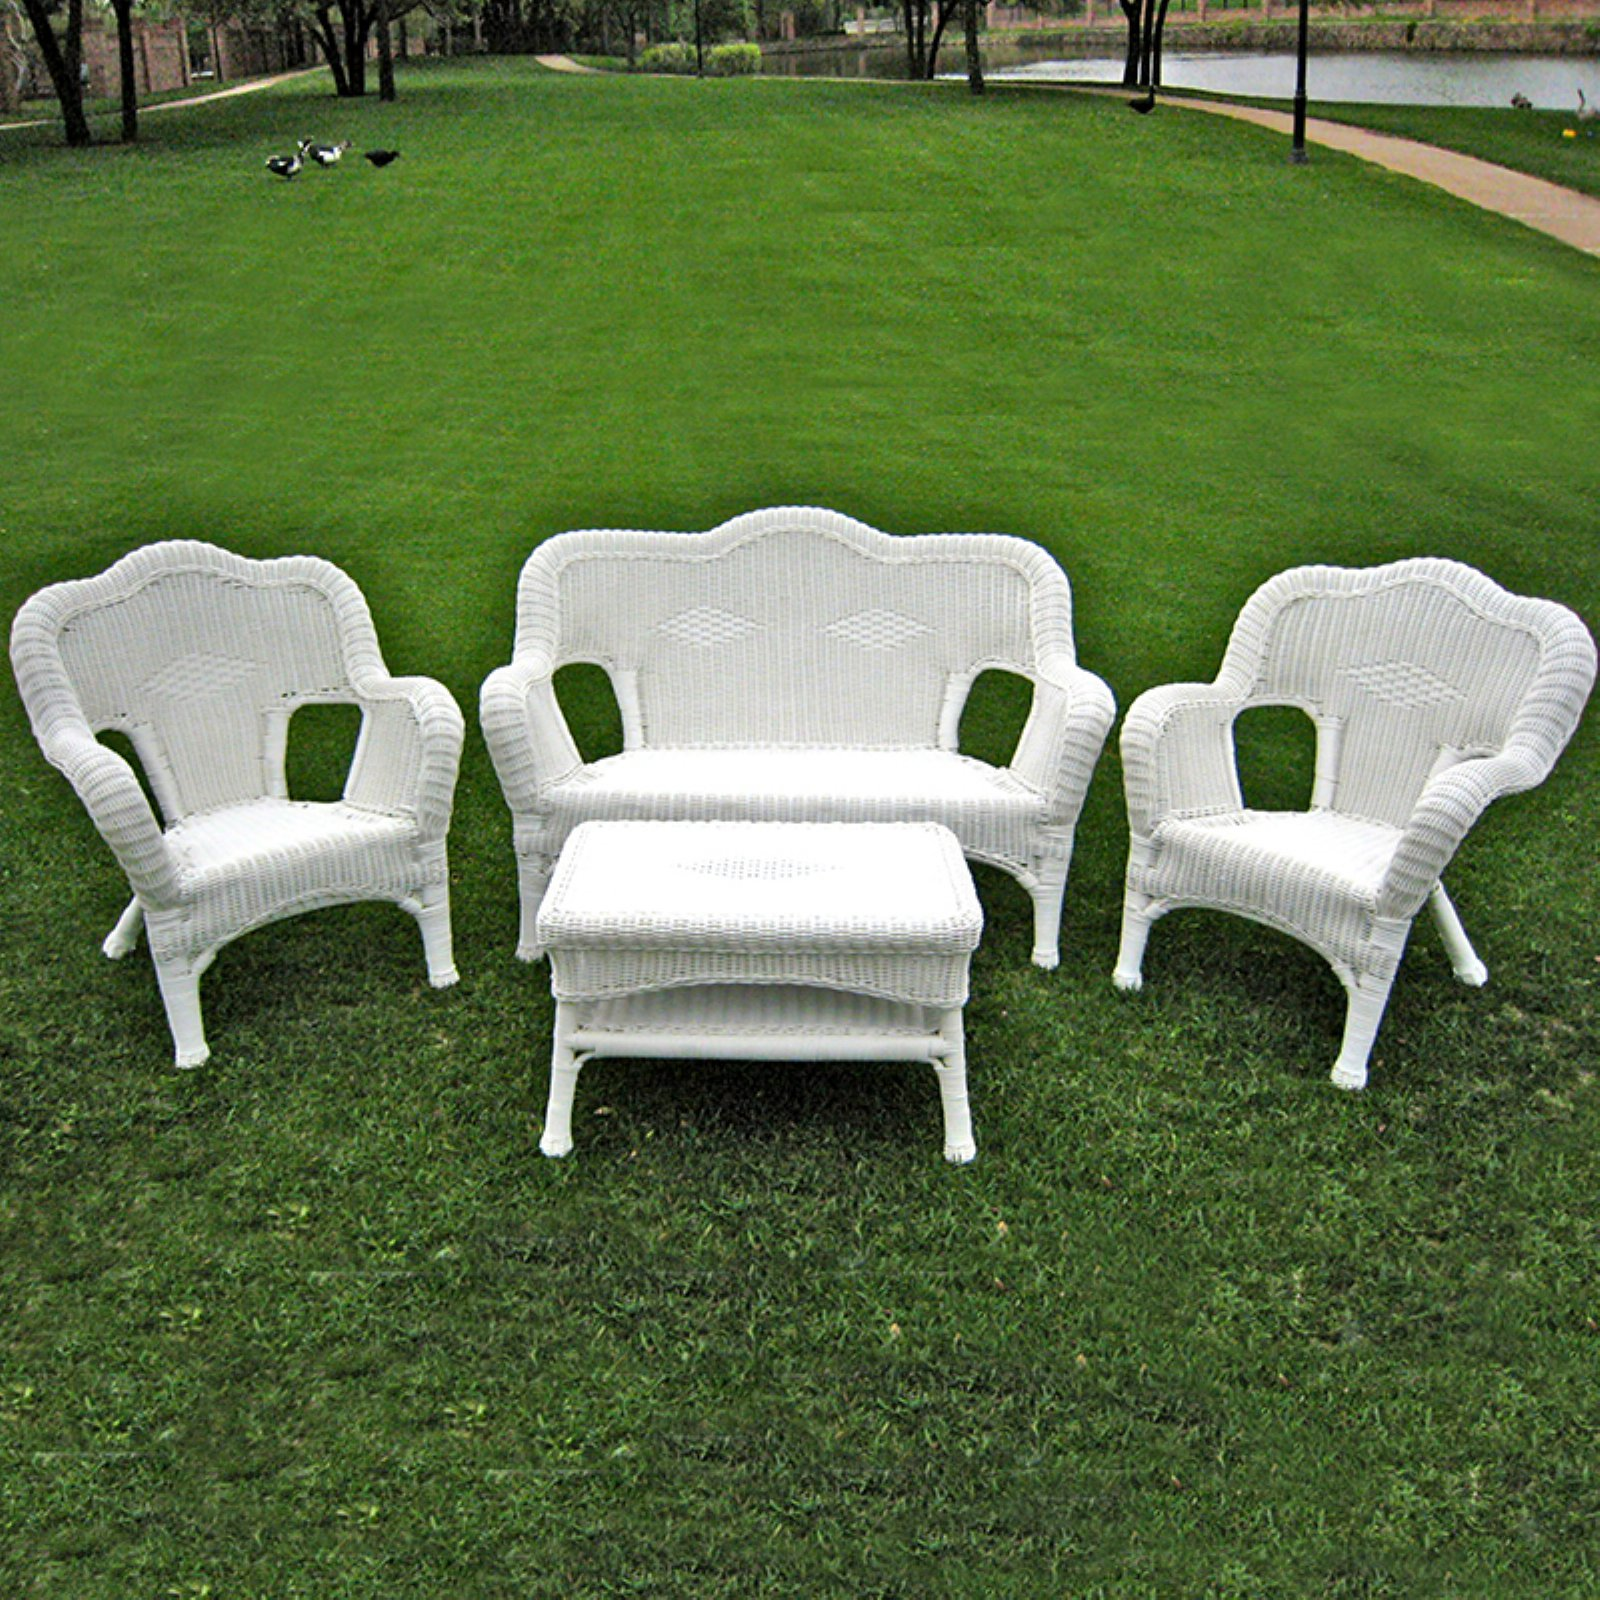 International Caravan Madison Wicker Resin Patio Conversation Set - Seats 4